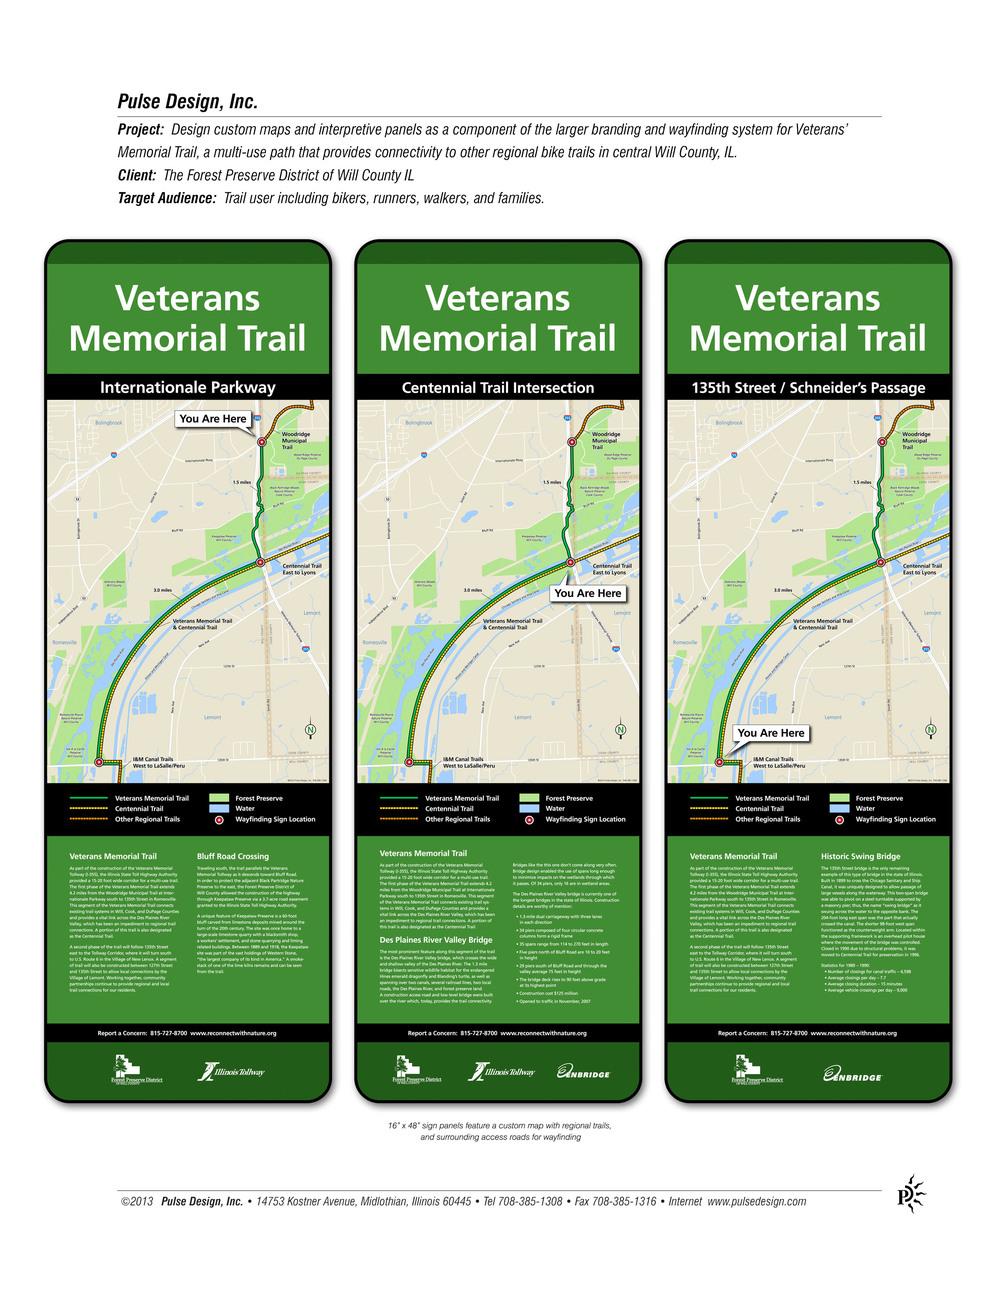 Veterans-Memorial-Trail-Sign-Maps-Pulse-Design-Inc.jpg